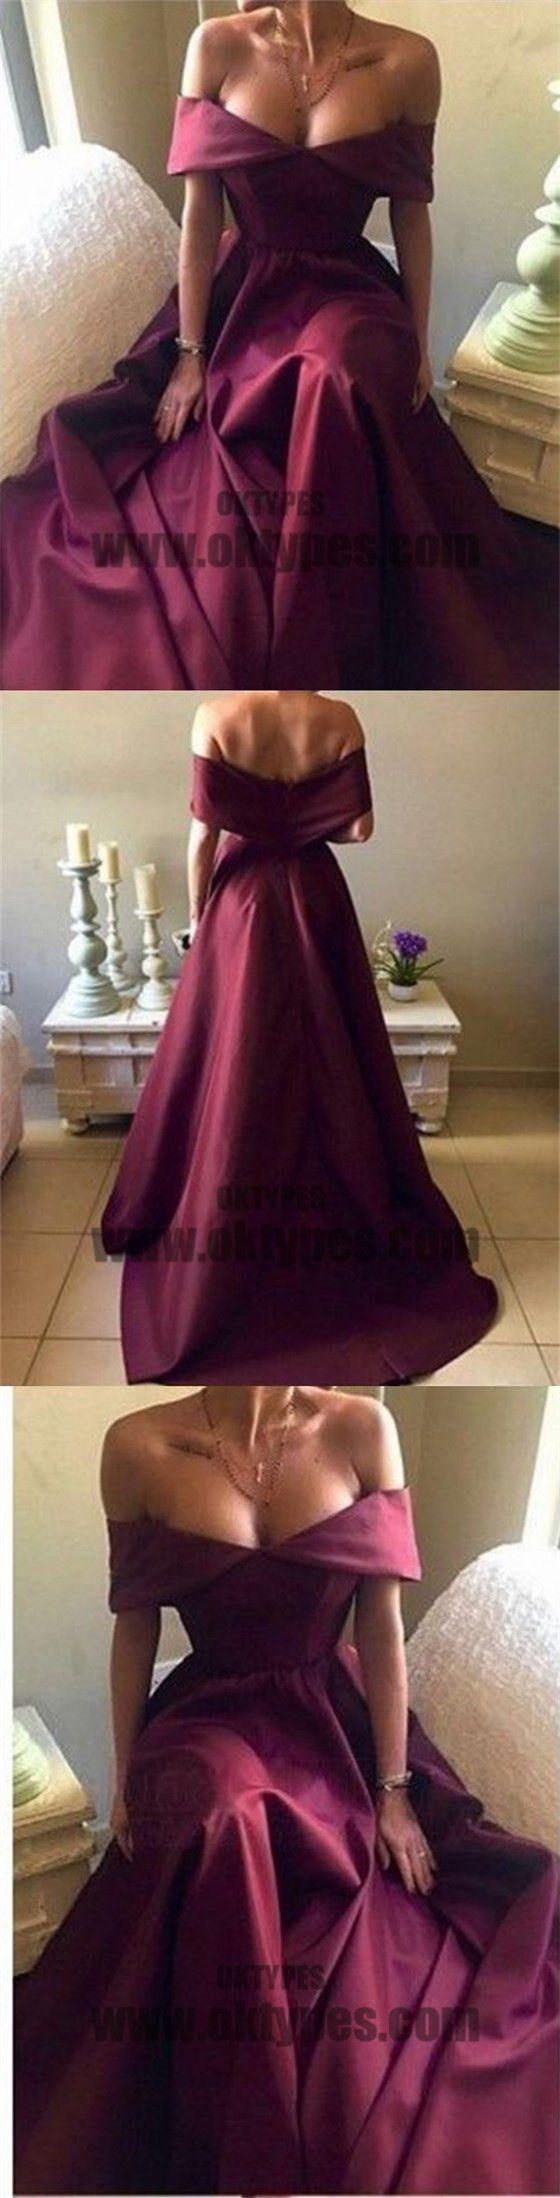 Long mermaid prom dresses offshoulder prom dresses backless prom